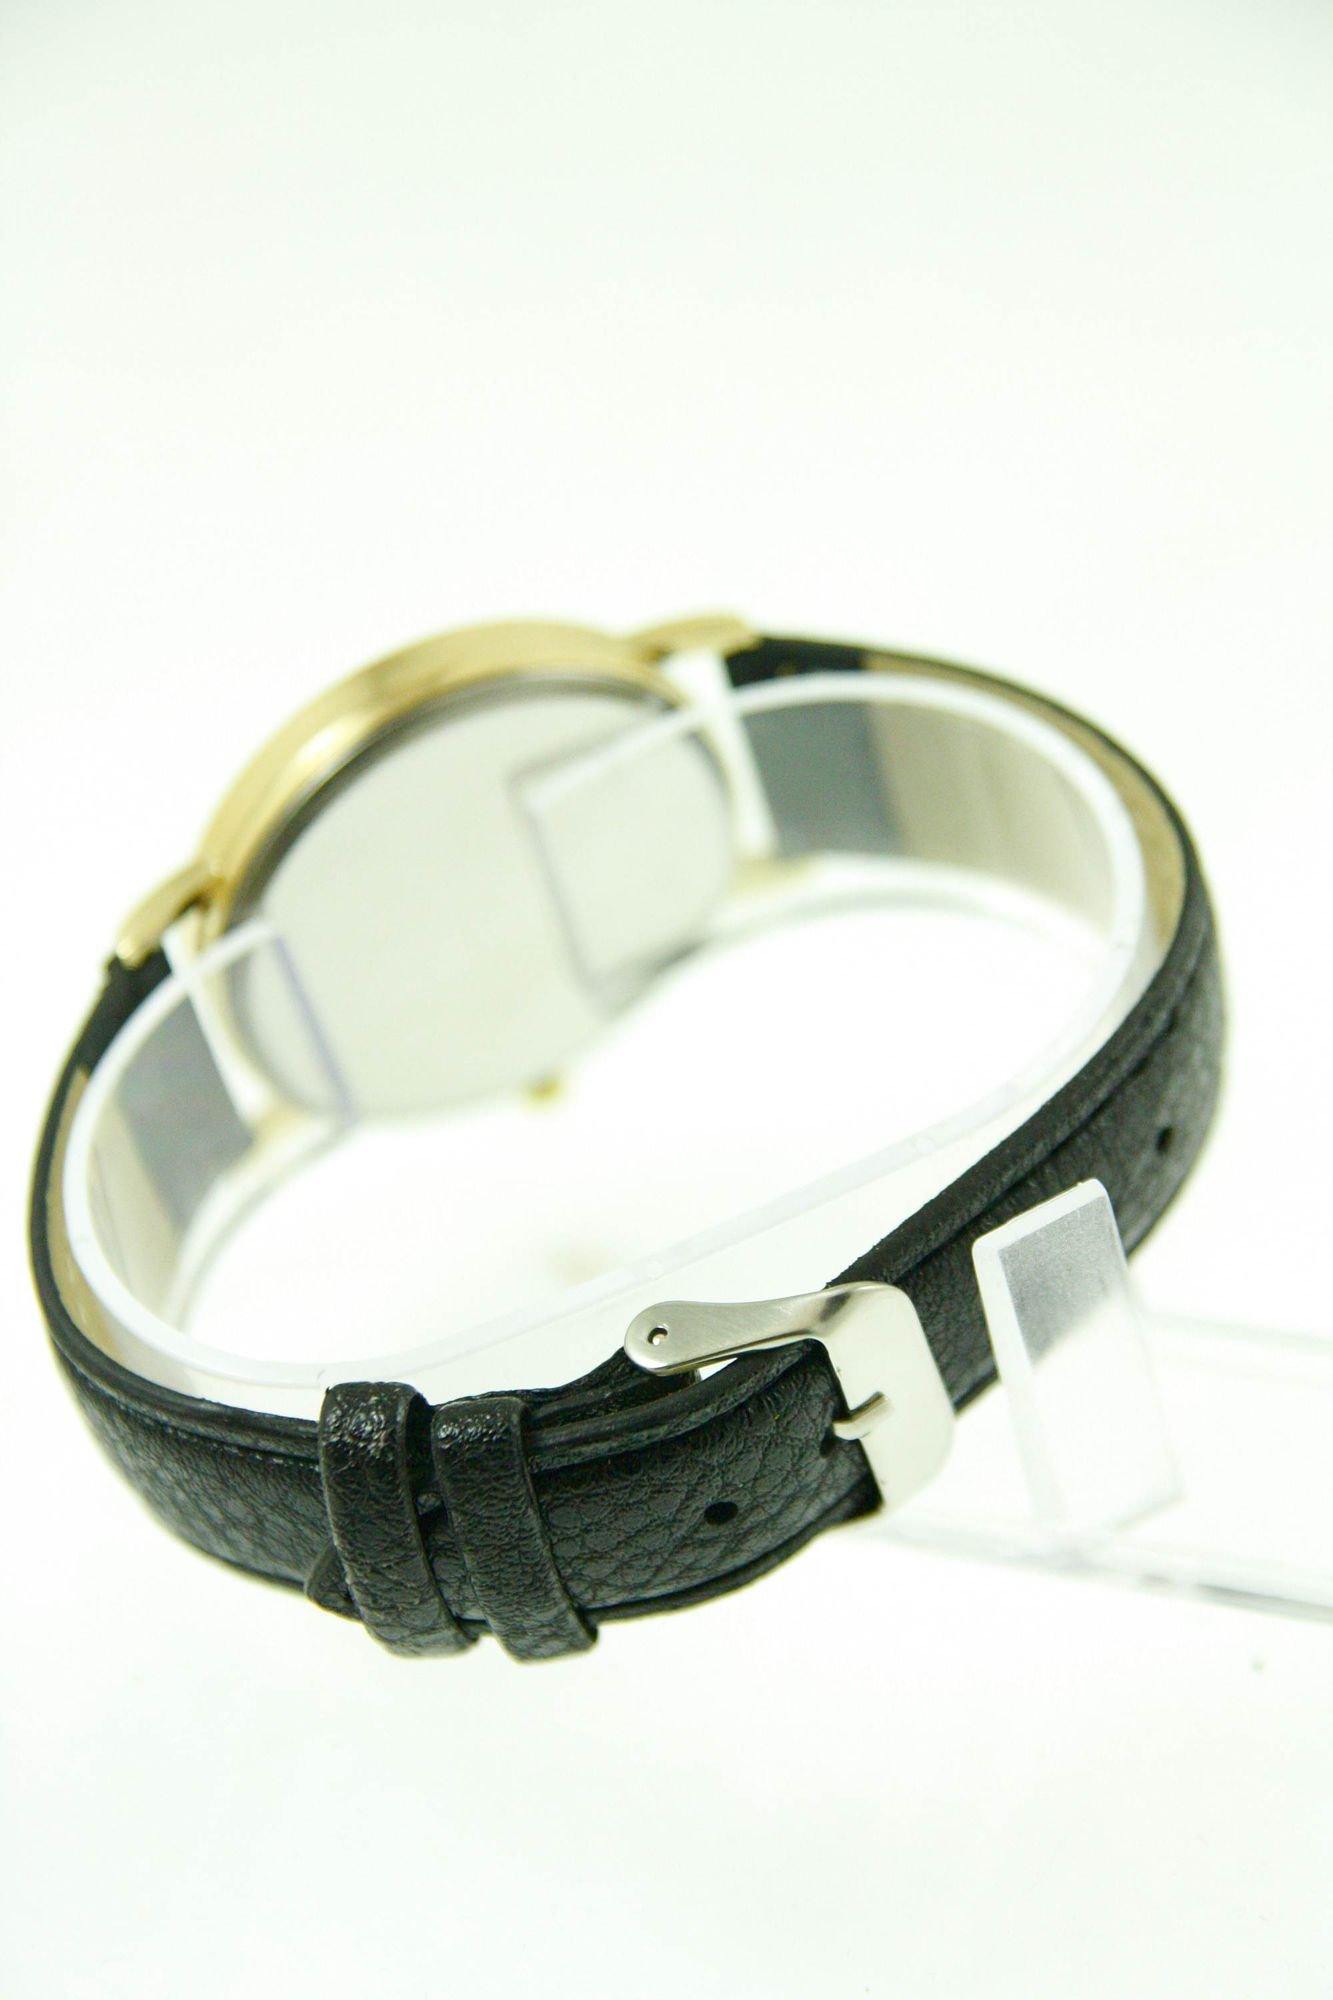 GENEVA Czarny zegarek damski na skórzanym pasku                                  zdj.                                  4